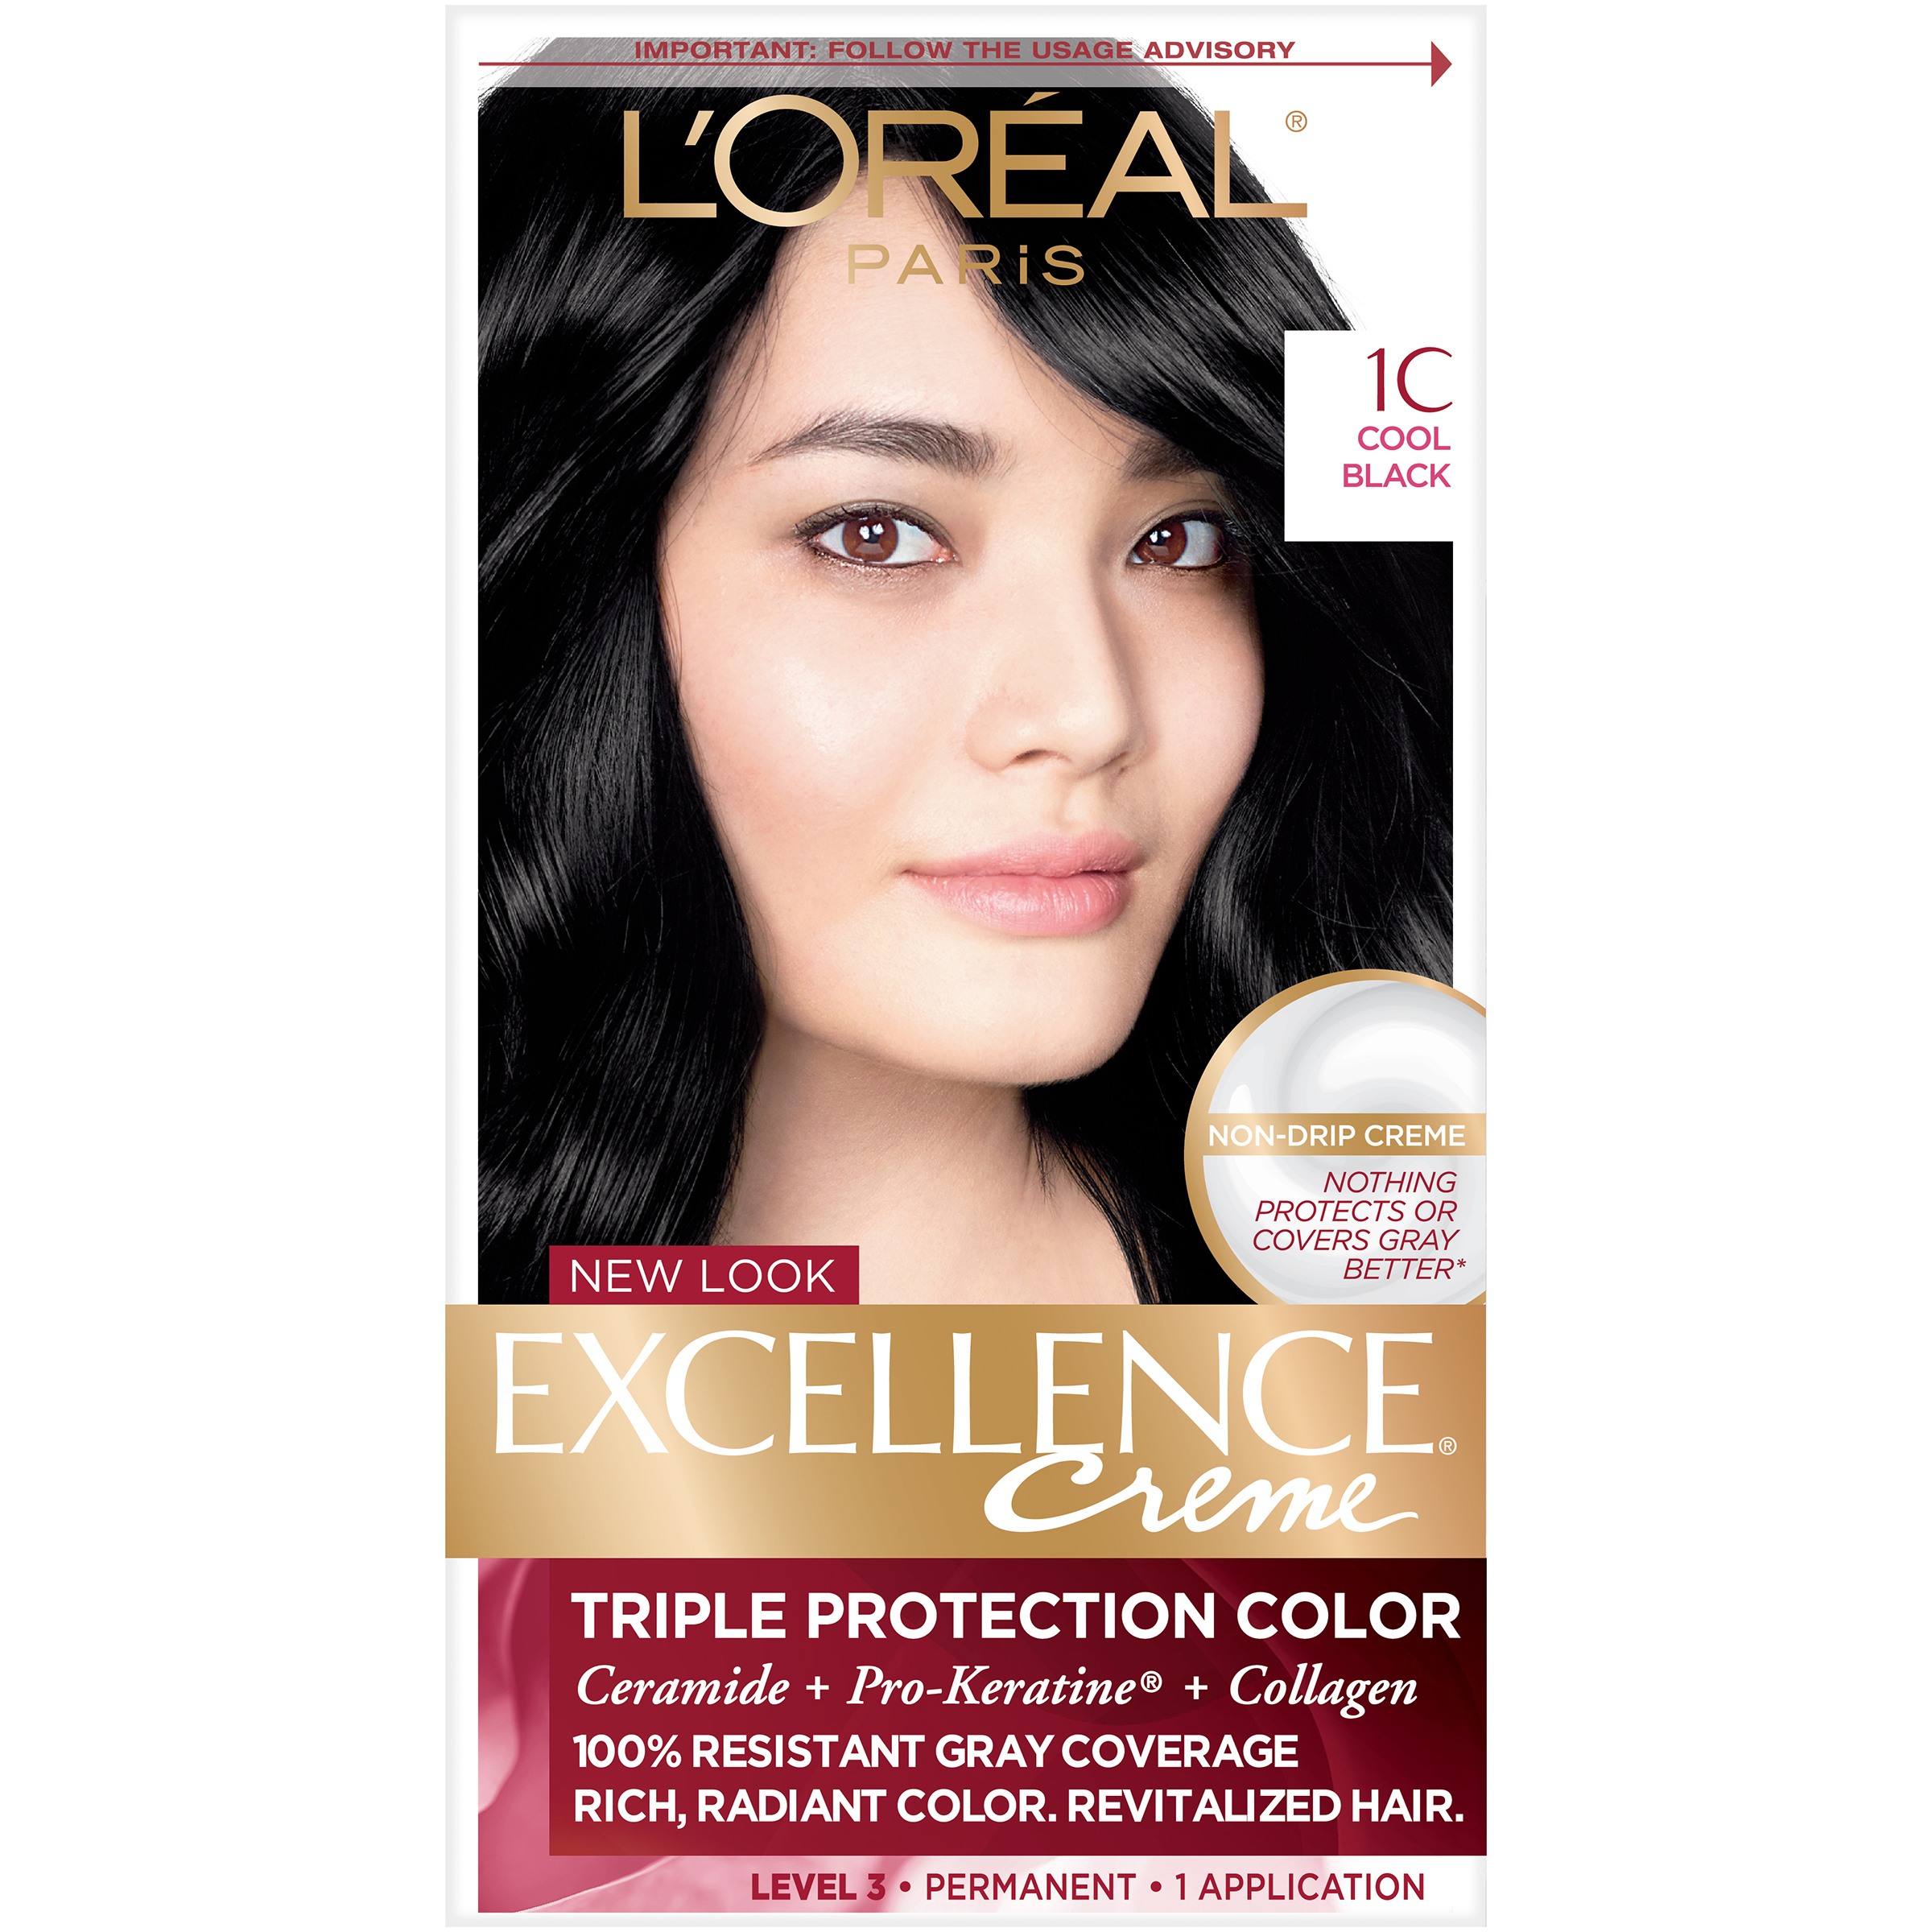 Loreal Paris Excellence Creme Triple Protection Hair Color Kit Cool